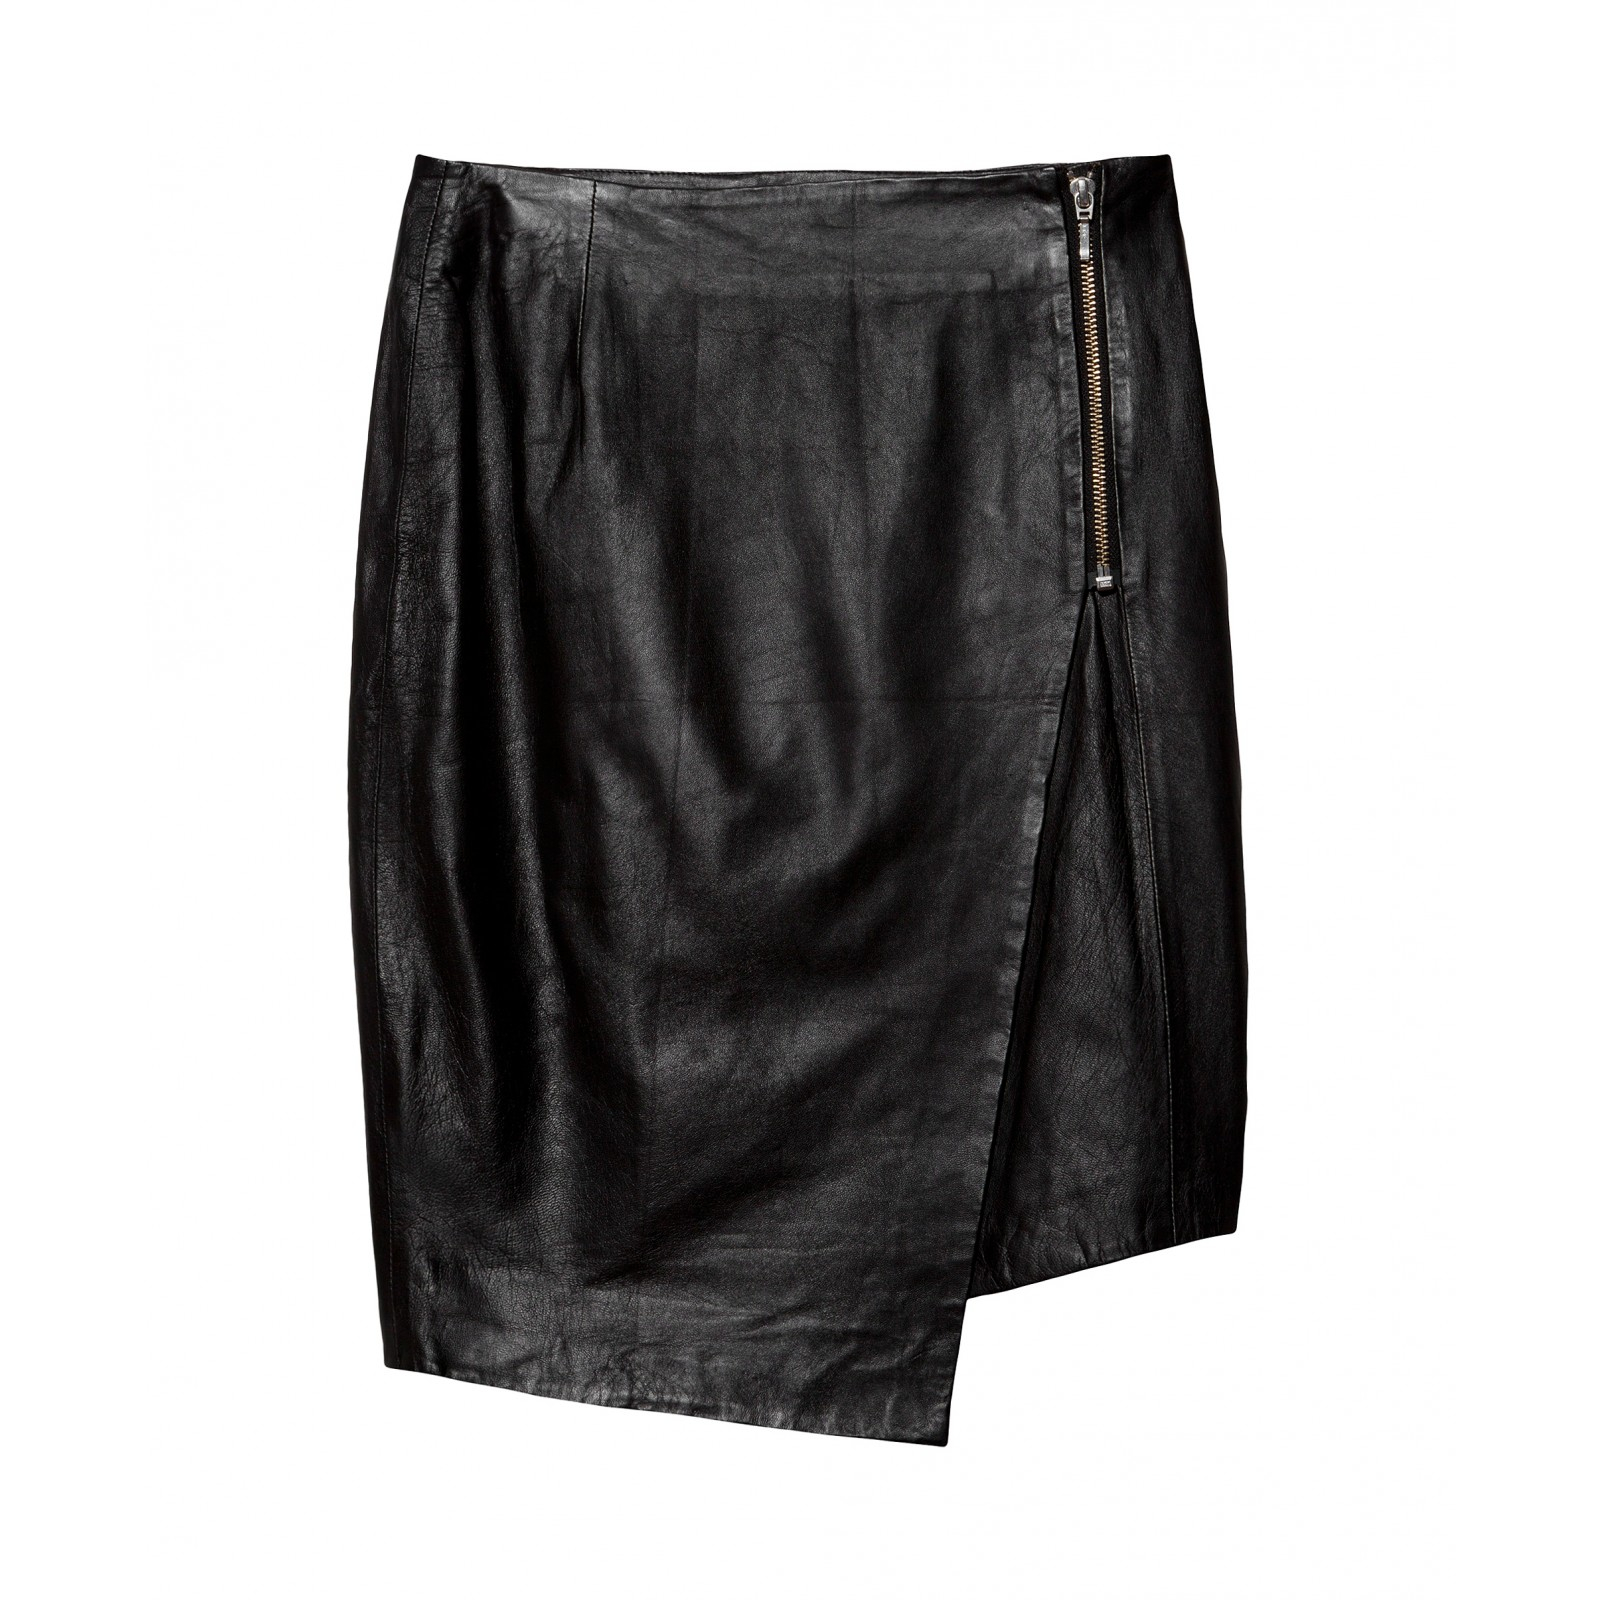 Nicholas Leather Asymmetrical Skirt in Black | Lyst